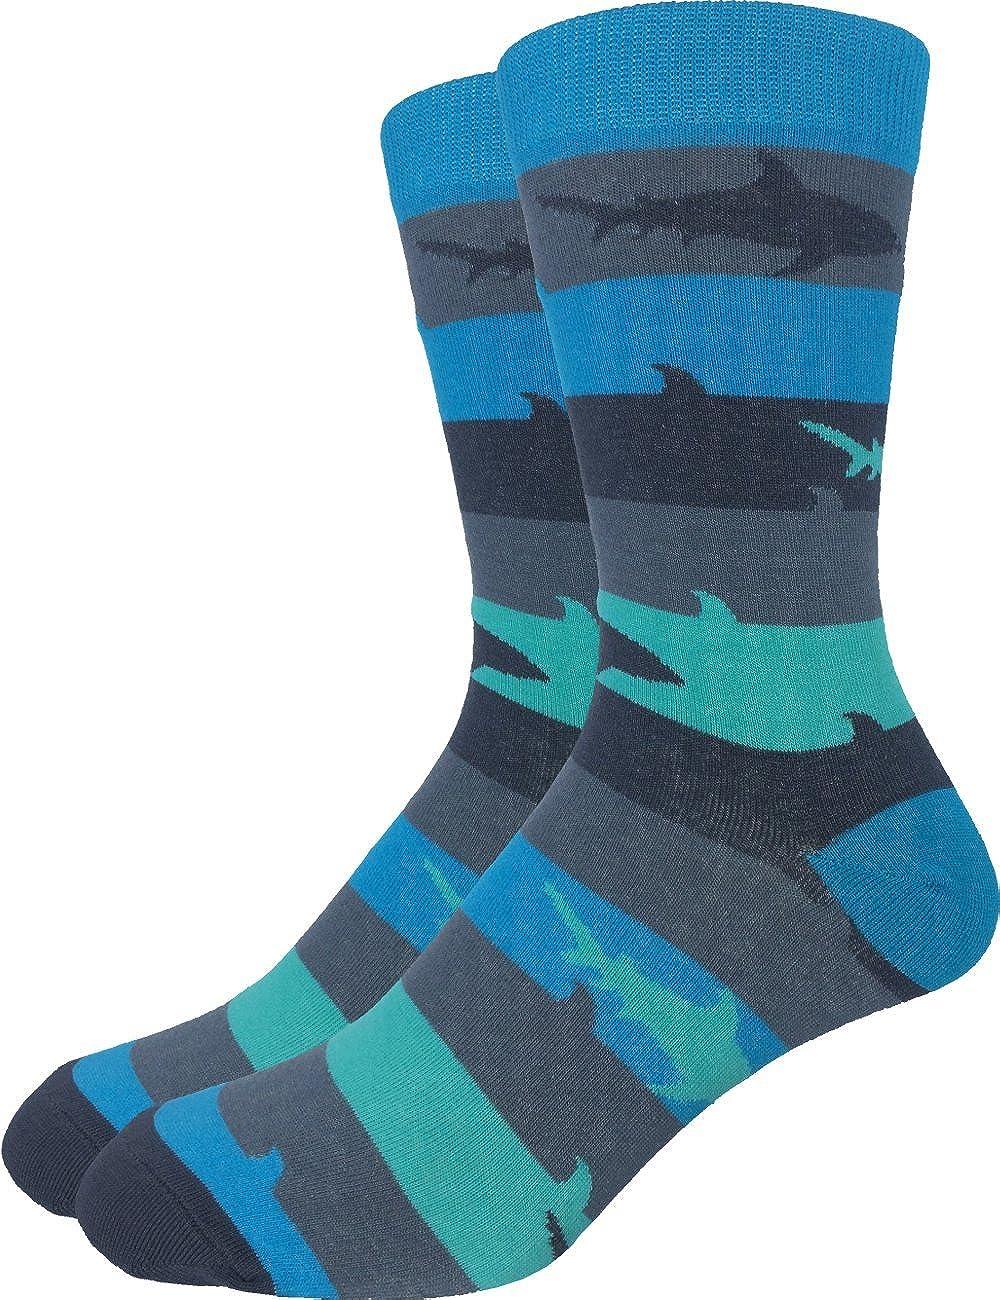 Good Luck Sock Men's Extra Large Striped Shark Socks, Size 13-17, Big & Tall